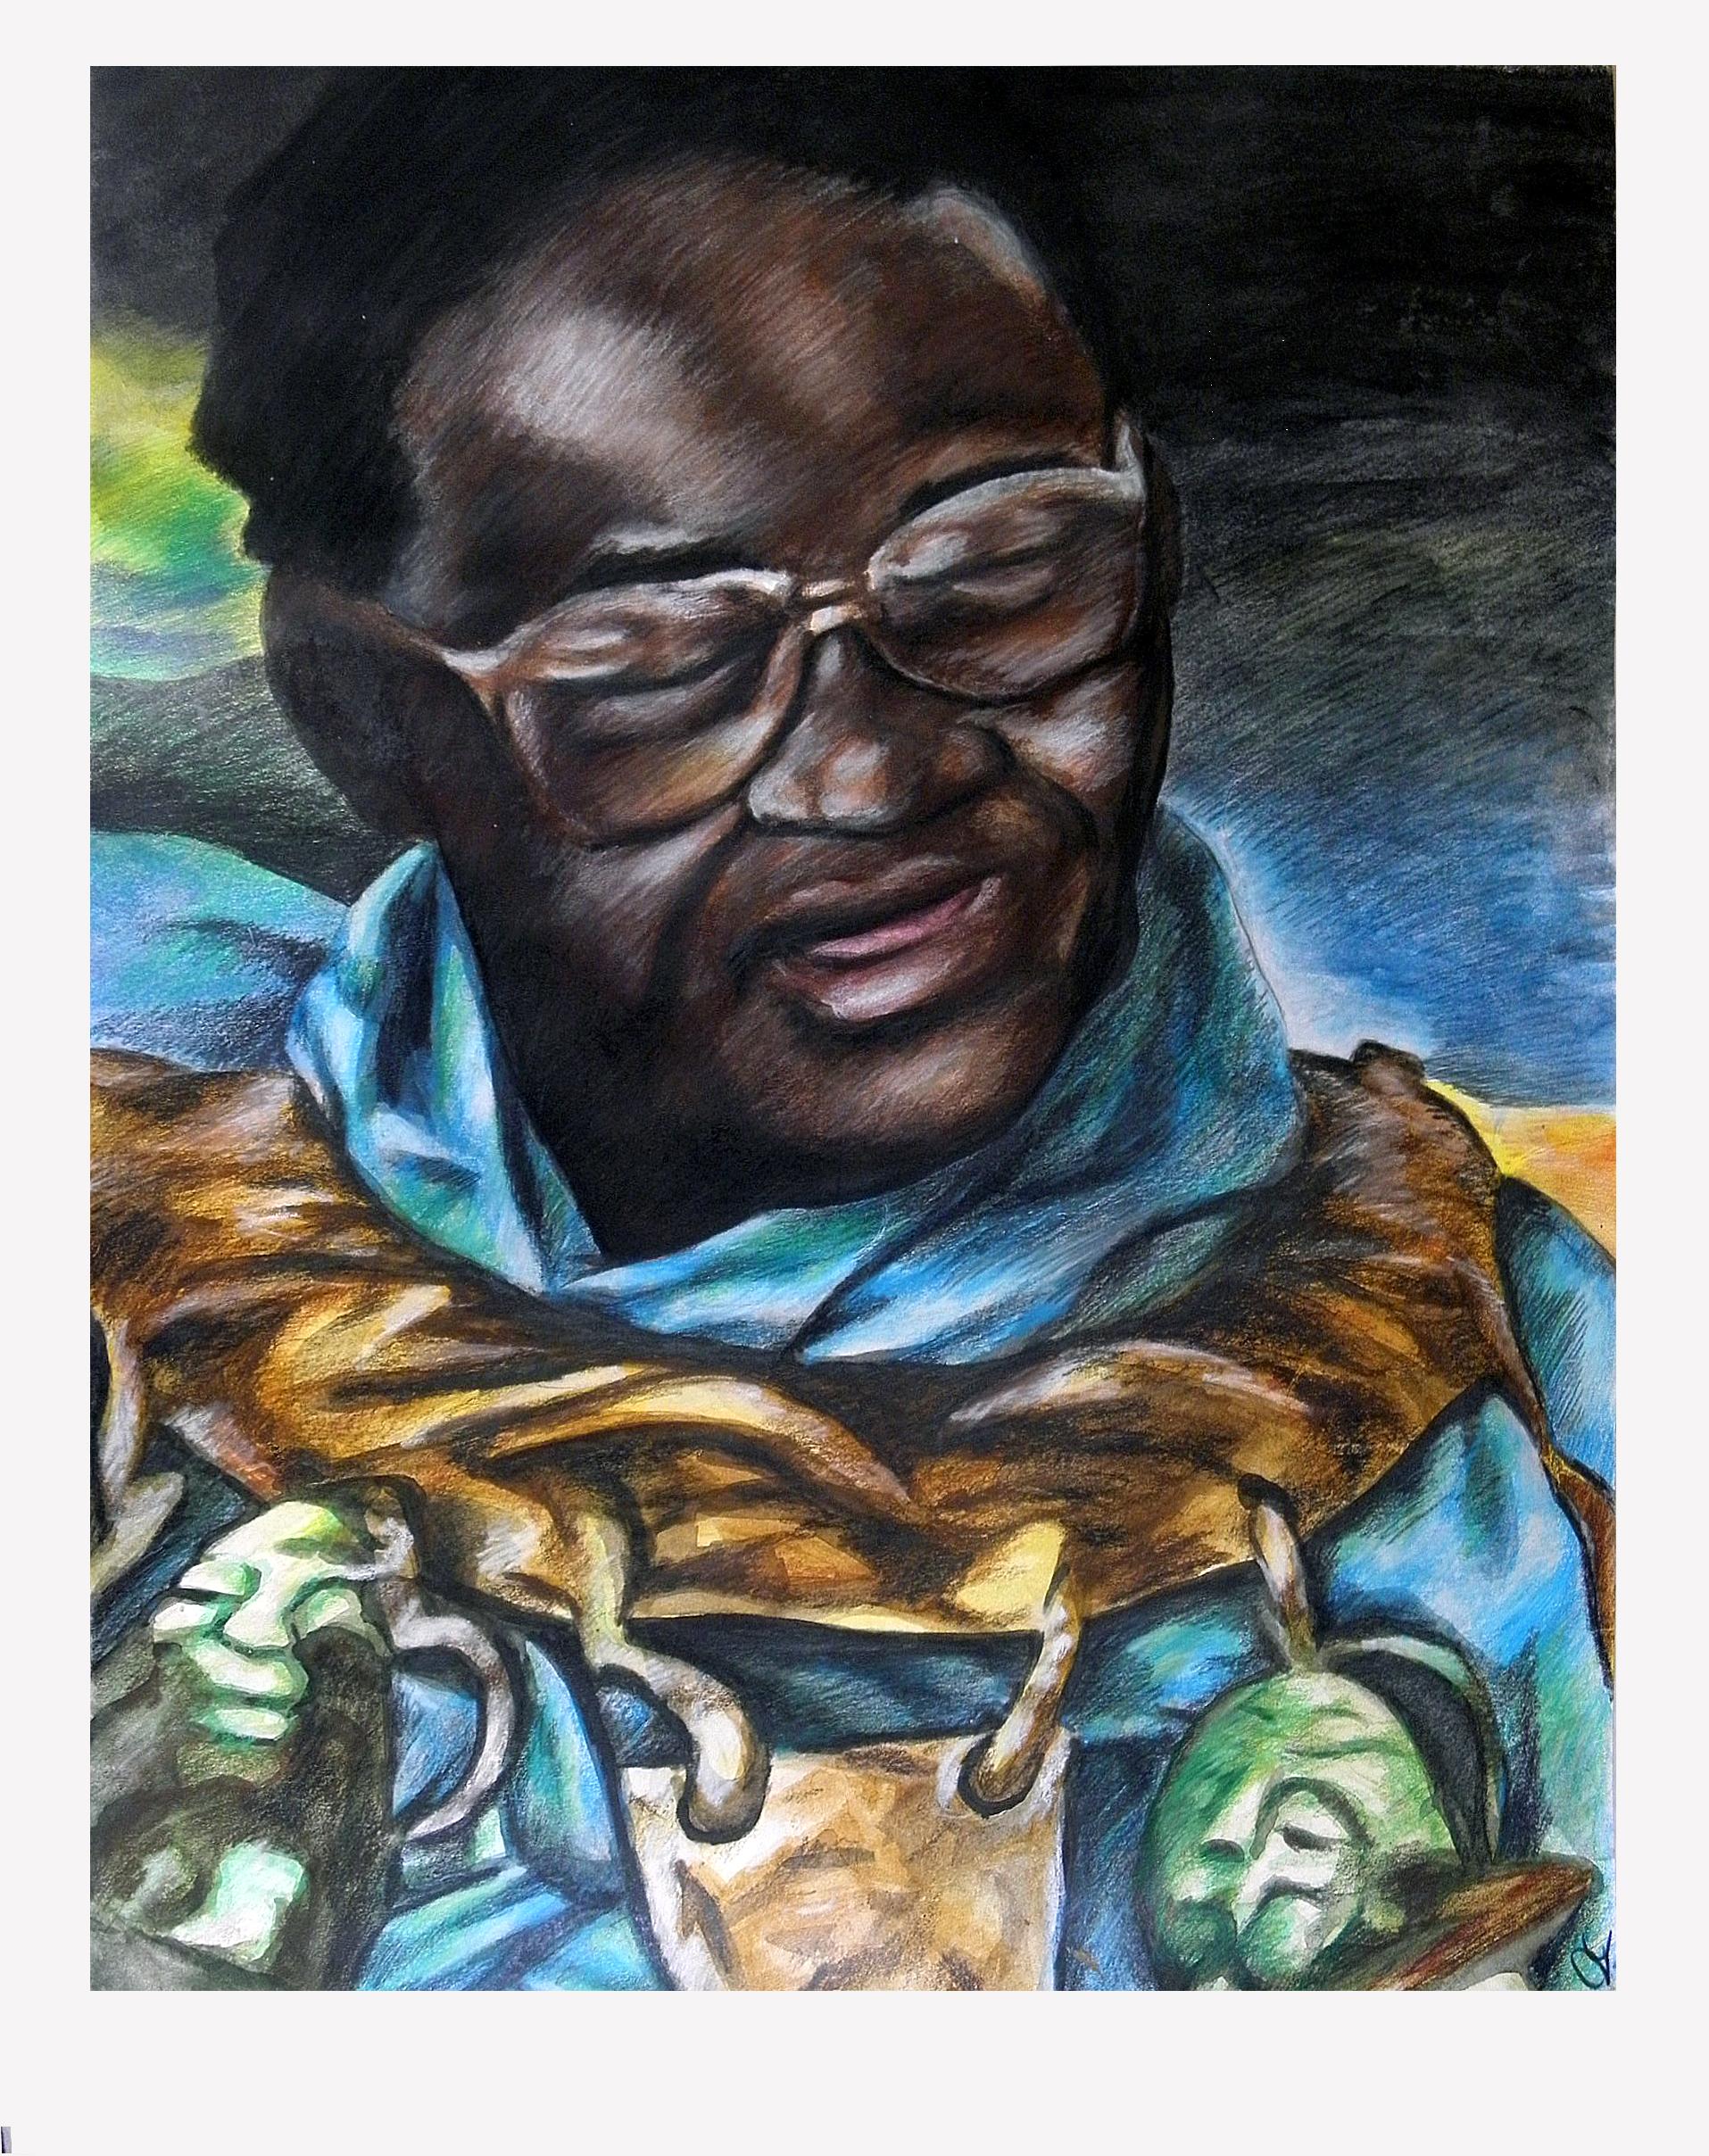 Vusamazulu Credo Mutwa Vusamazulu Credo Mutwa by Phabellis on DeviantArt